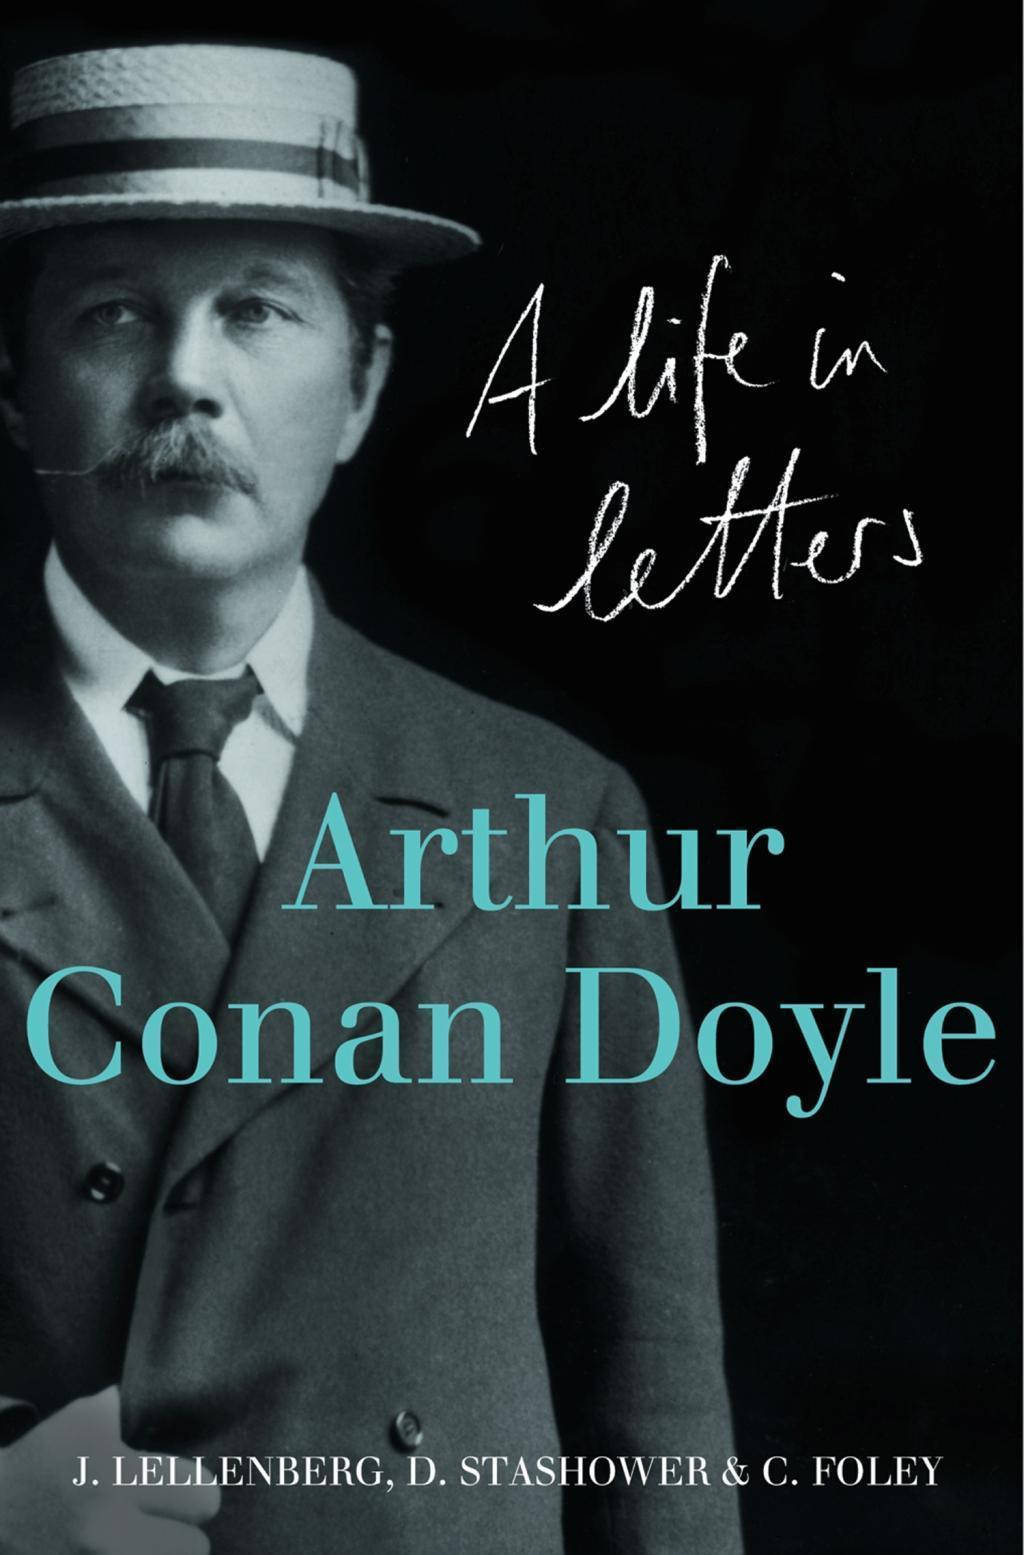 Arthur Conan Doyle: A Life in Letters